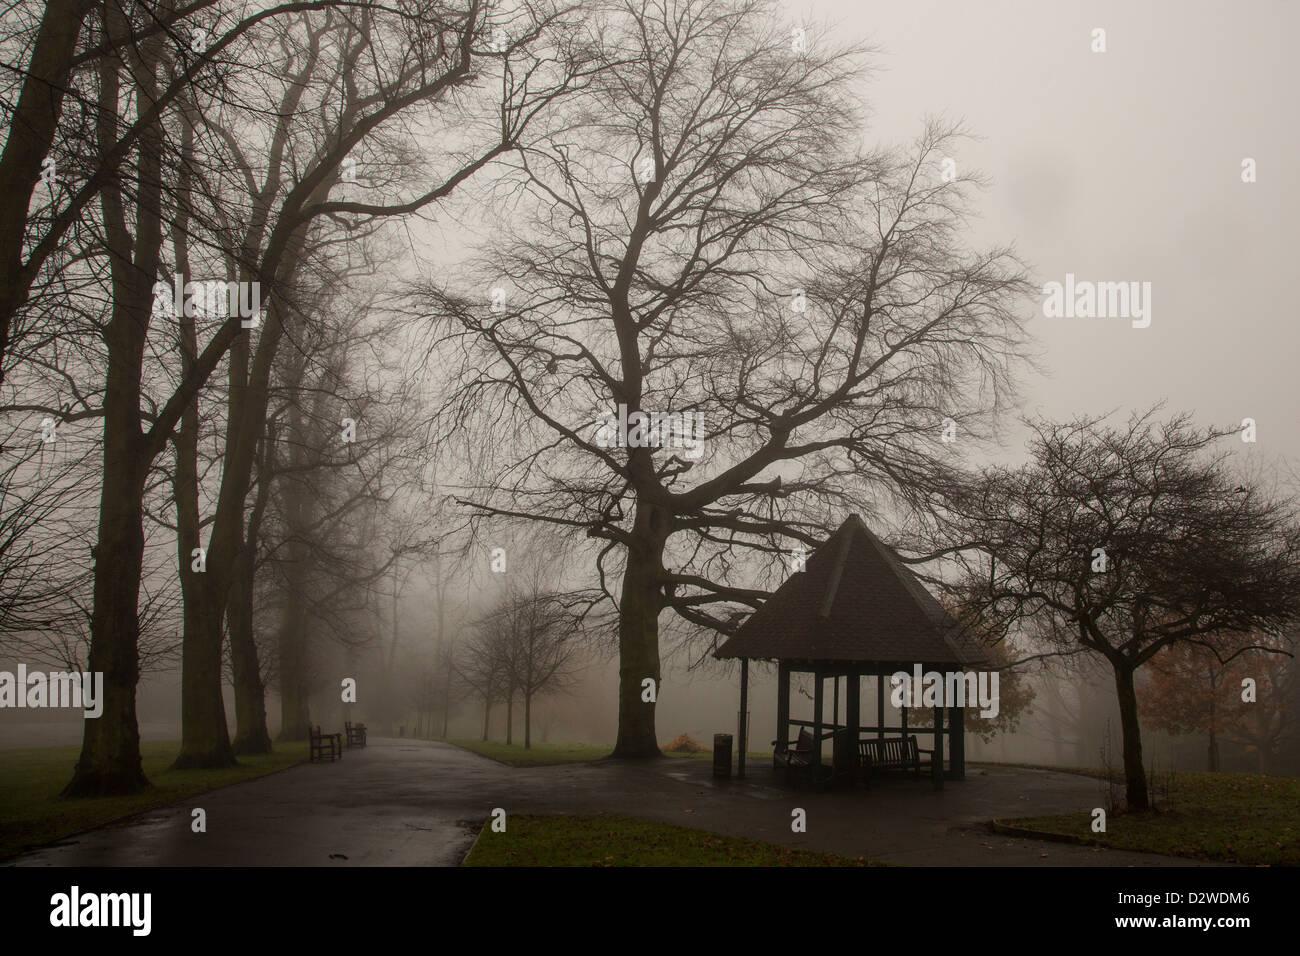 foggy morning, Waterlow Park, Highgate, London - Stock Image